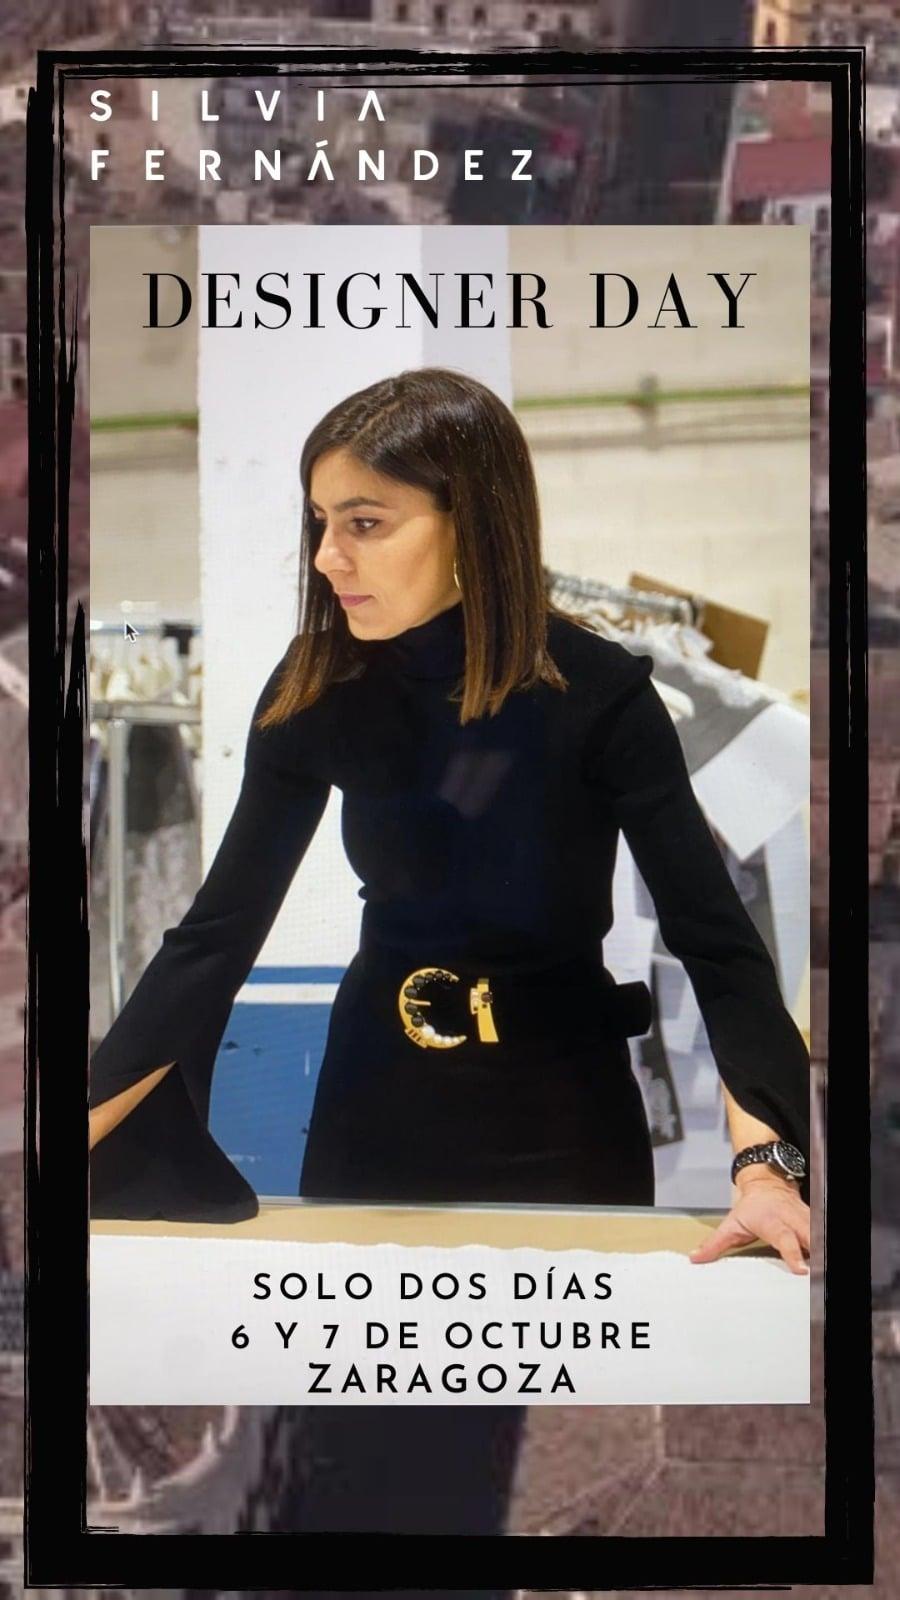 Vestidos de novia - Silvia Fernandez Atelier - DESIGNER DAY